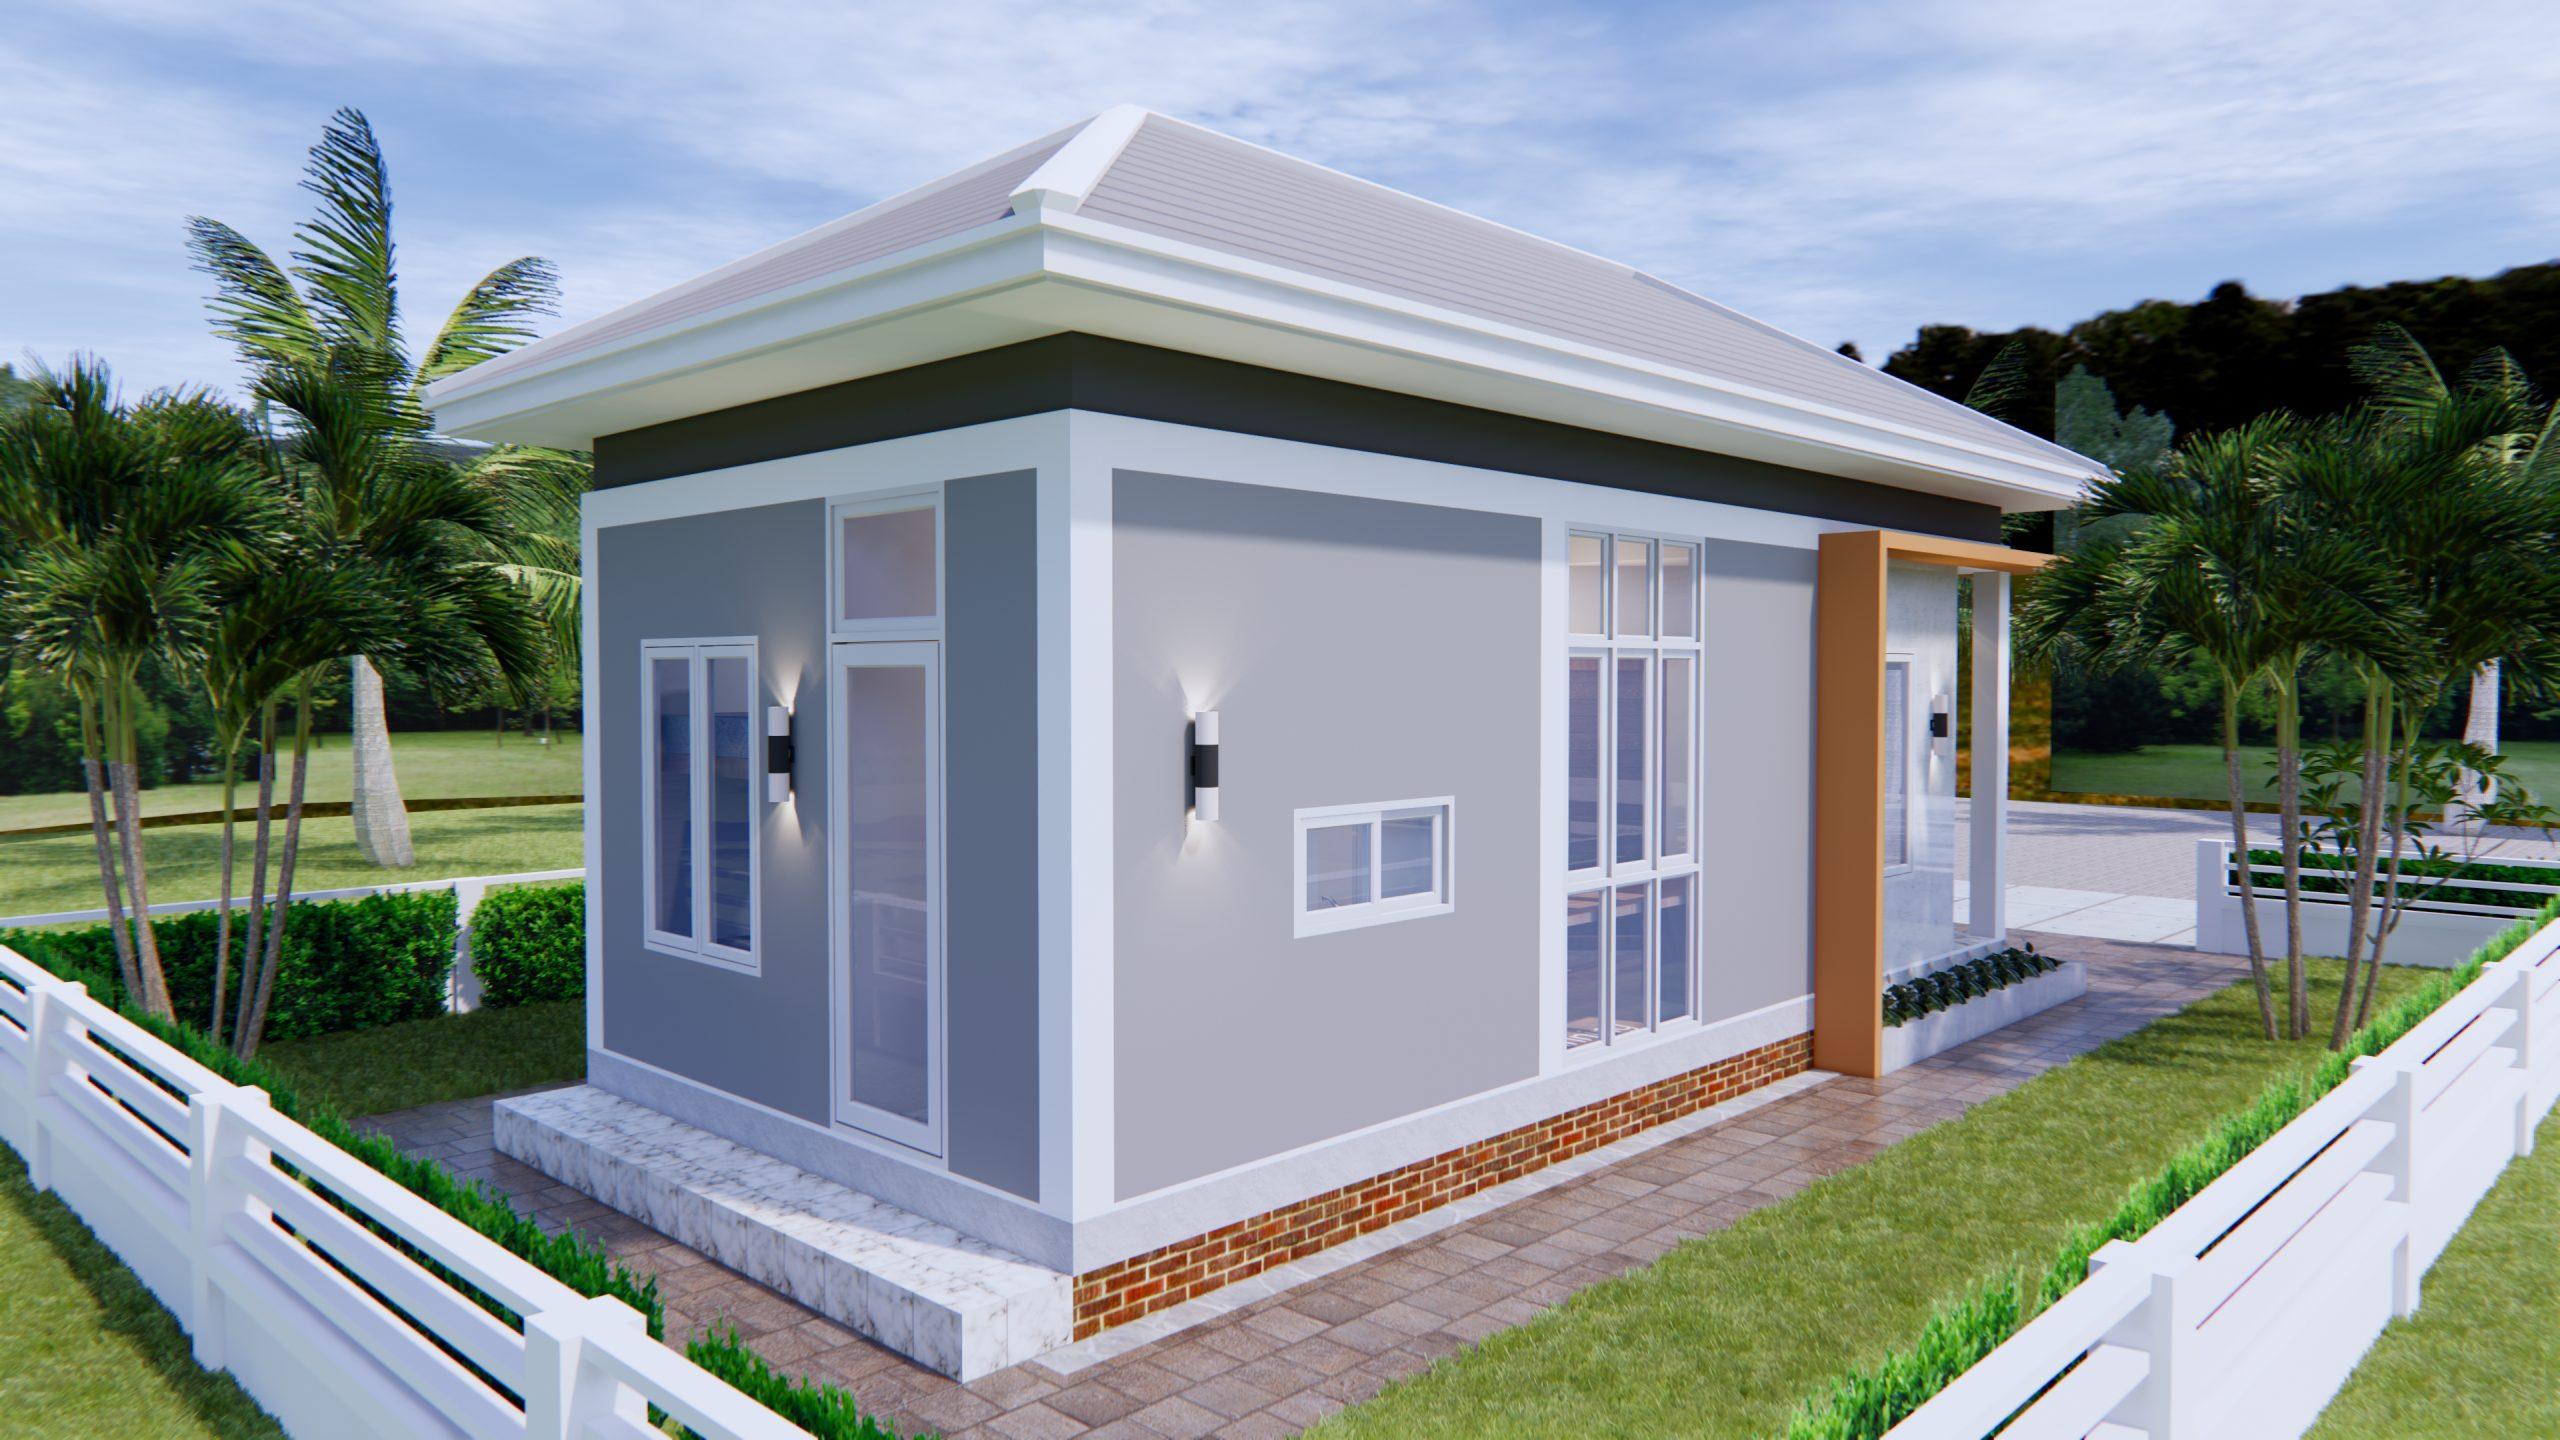 New Home Plans 4x9 Meter 13x30 Feet 3